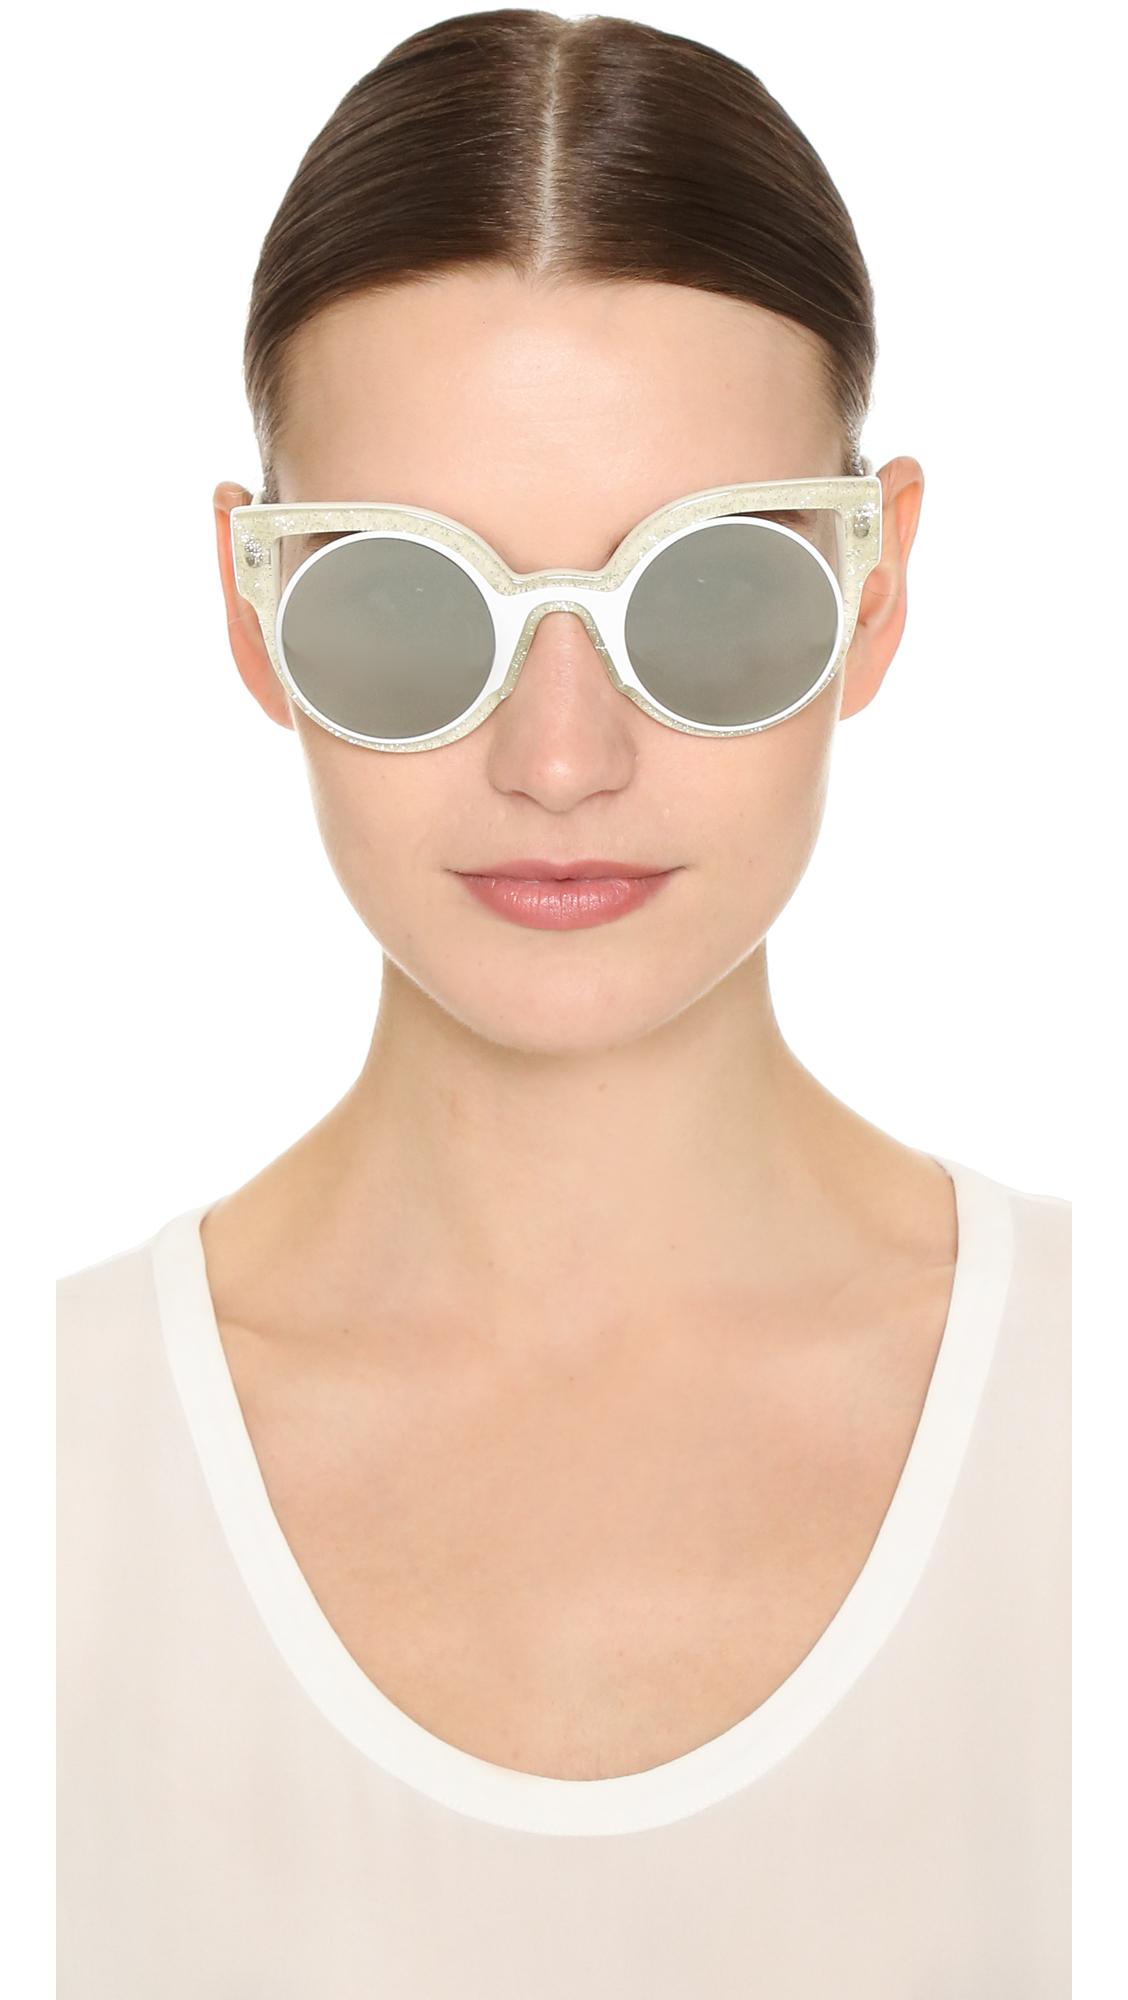 3ad1a23ee6 Lyst - Fendi Round Cutout Sunglasses - Glitter White silver in White